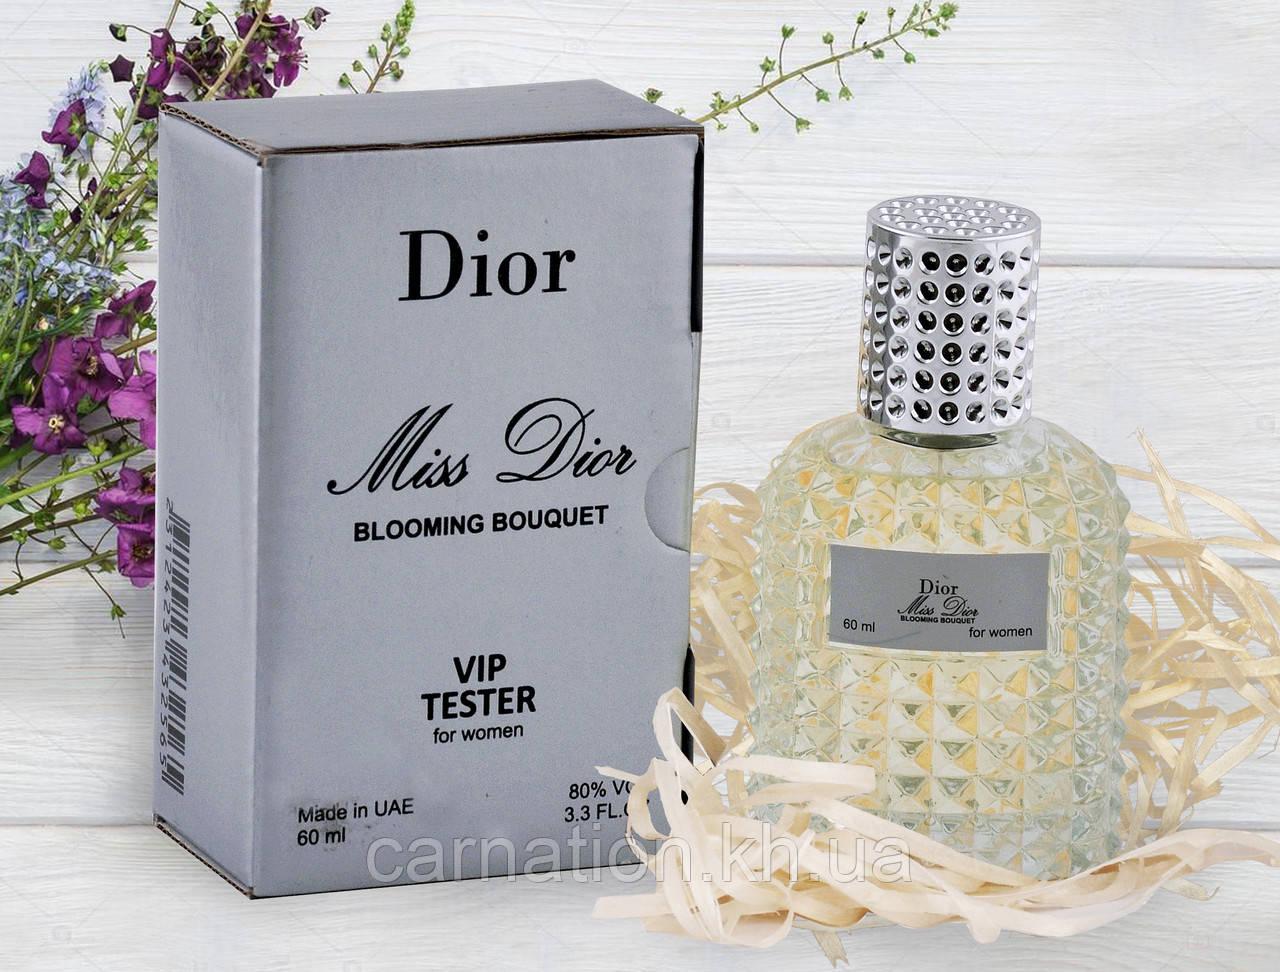 Тестер  Dior Miss Dyorii Blooming Bouquet Vip (Блуминг Букет) 60 мл